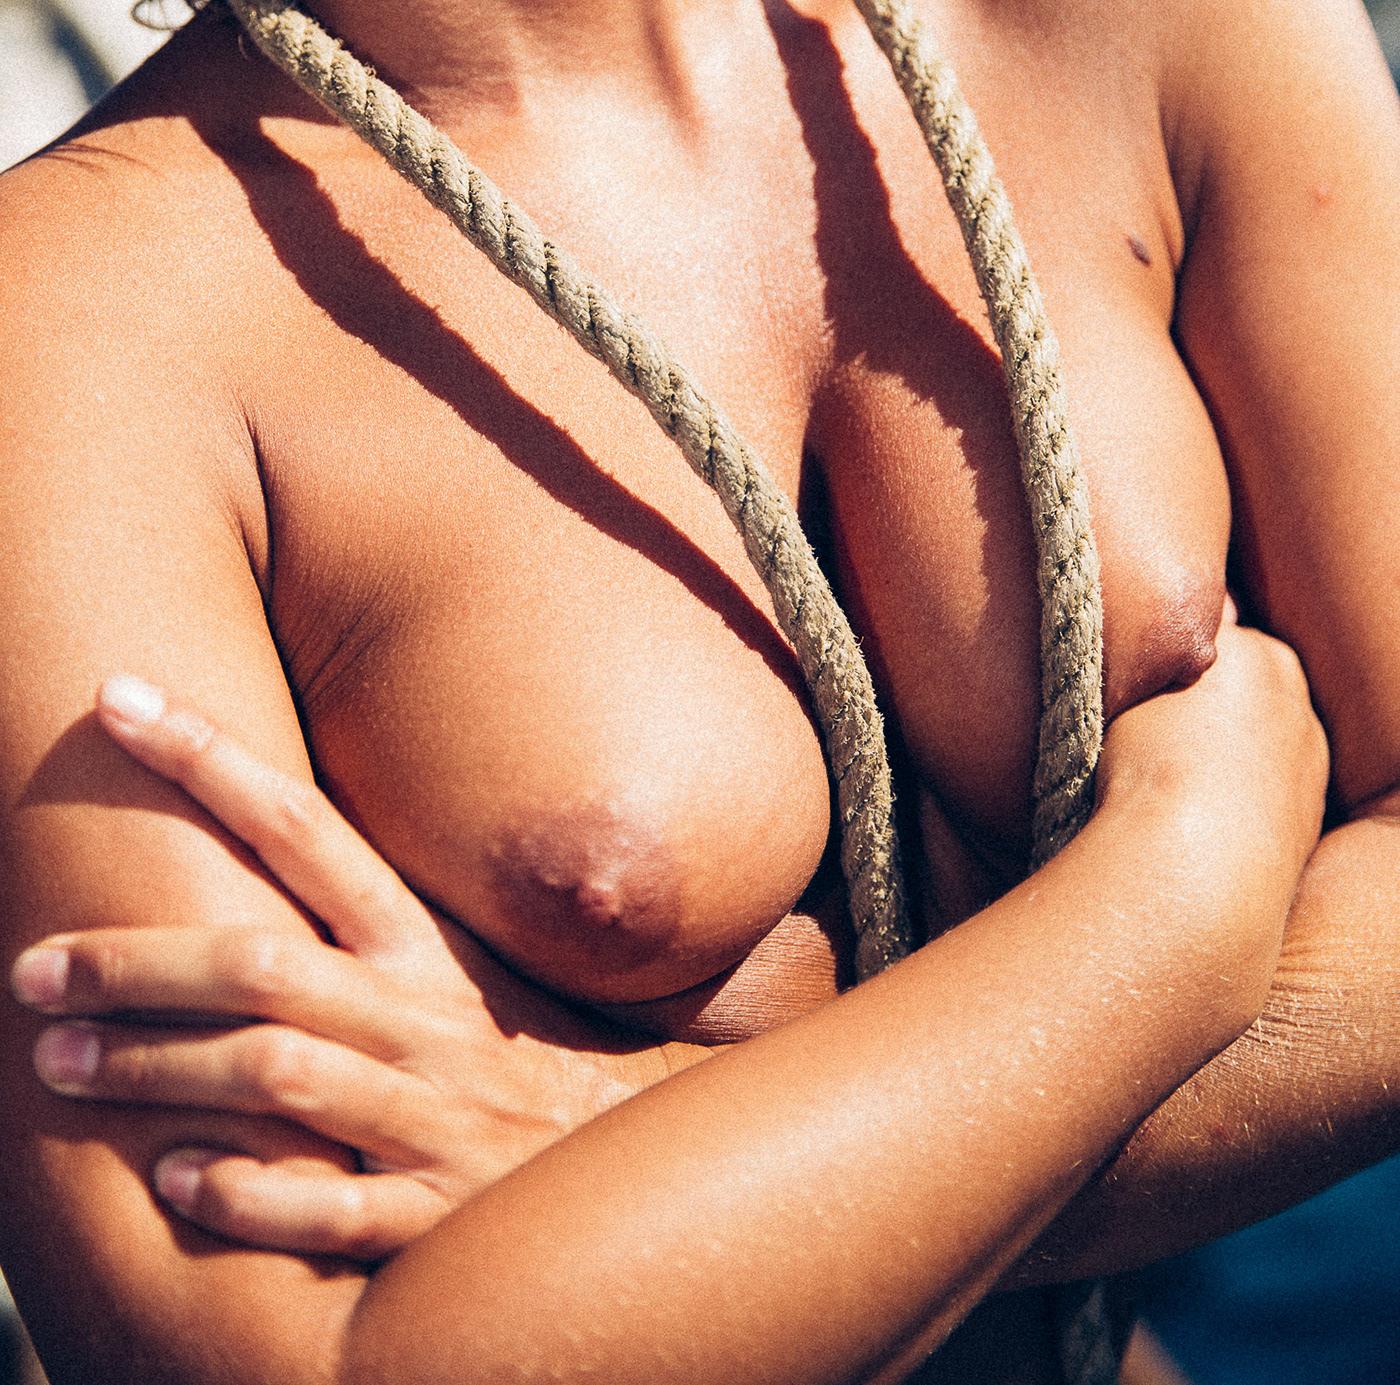 Marisa Papen Au Natural / фото Thomas Agatz